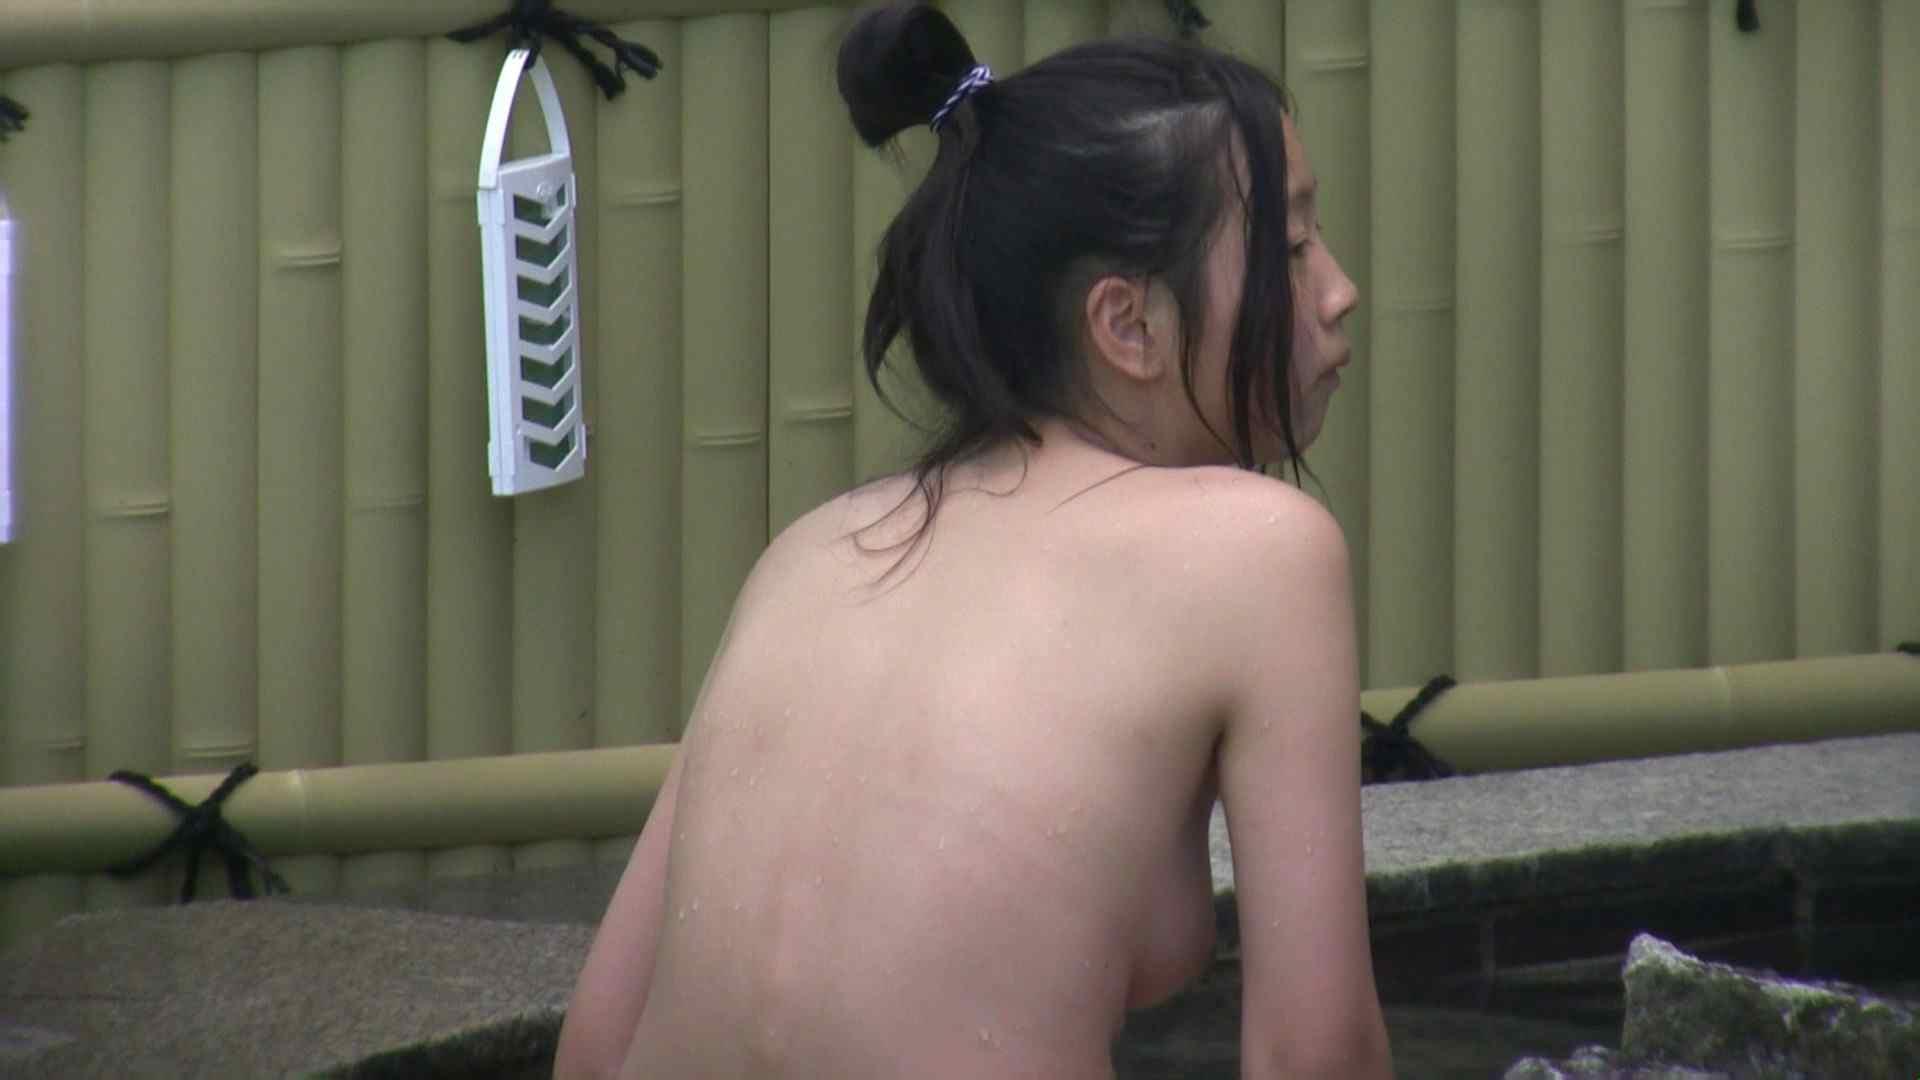 Aquaな露天風呂Vol.87【VIP限定】 盗撮 SEX無修正画像 92画像 80